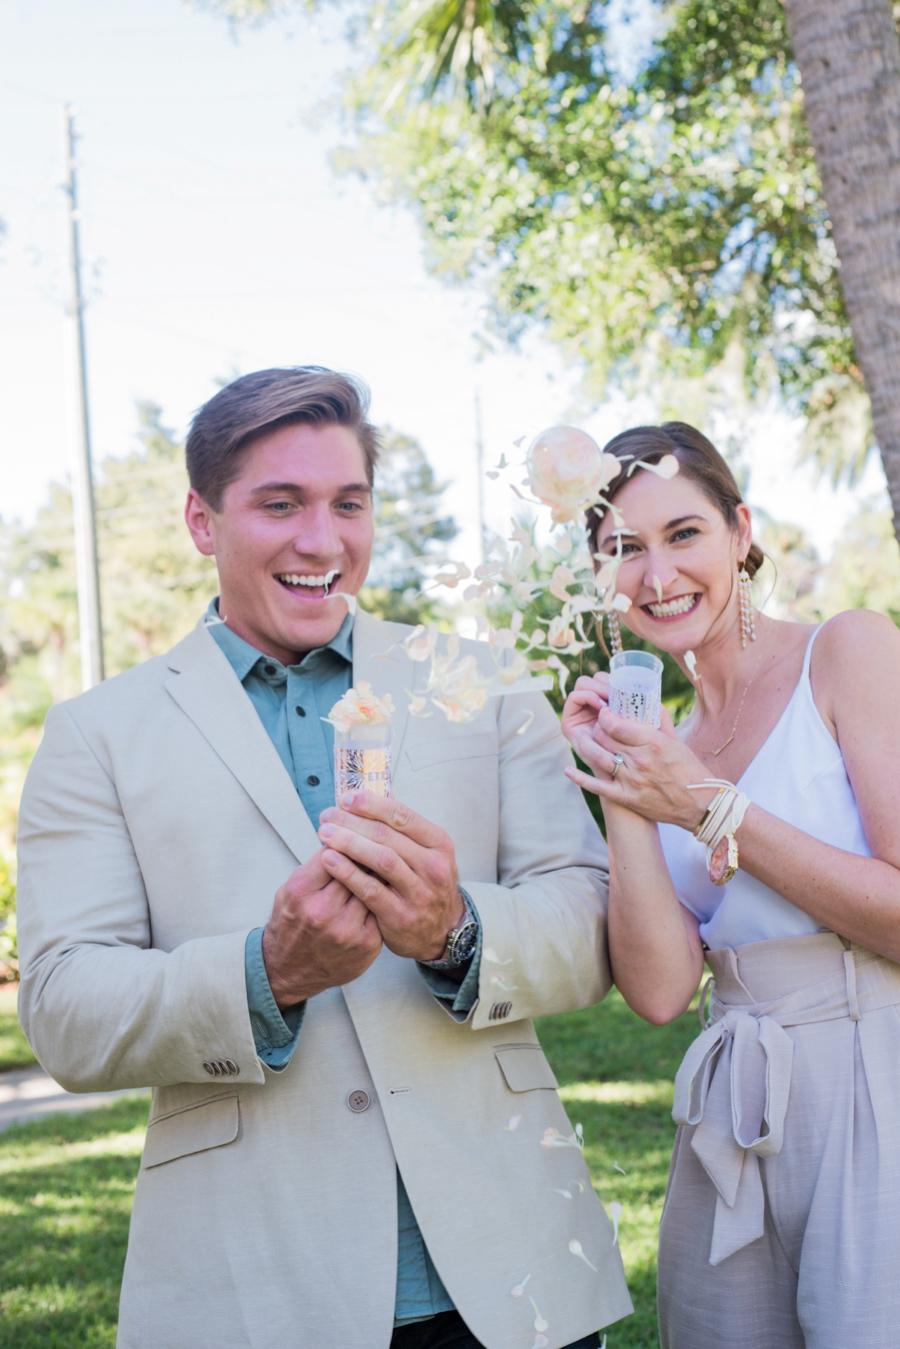 Blush and Copper Bridesmaid Spa Day Inspiration via TheELD.com